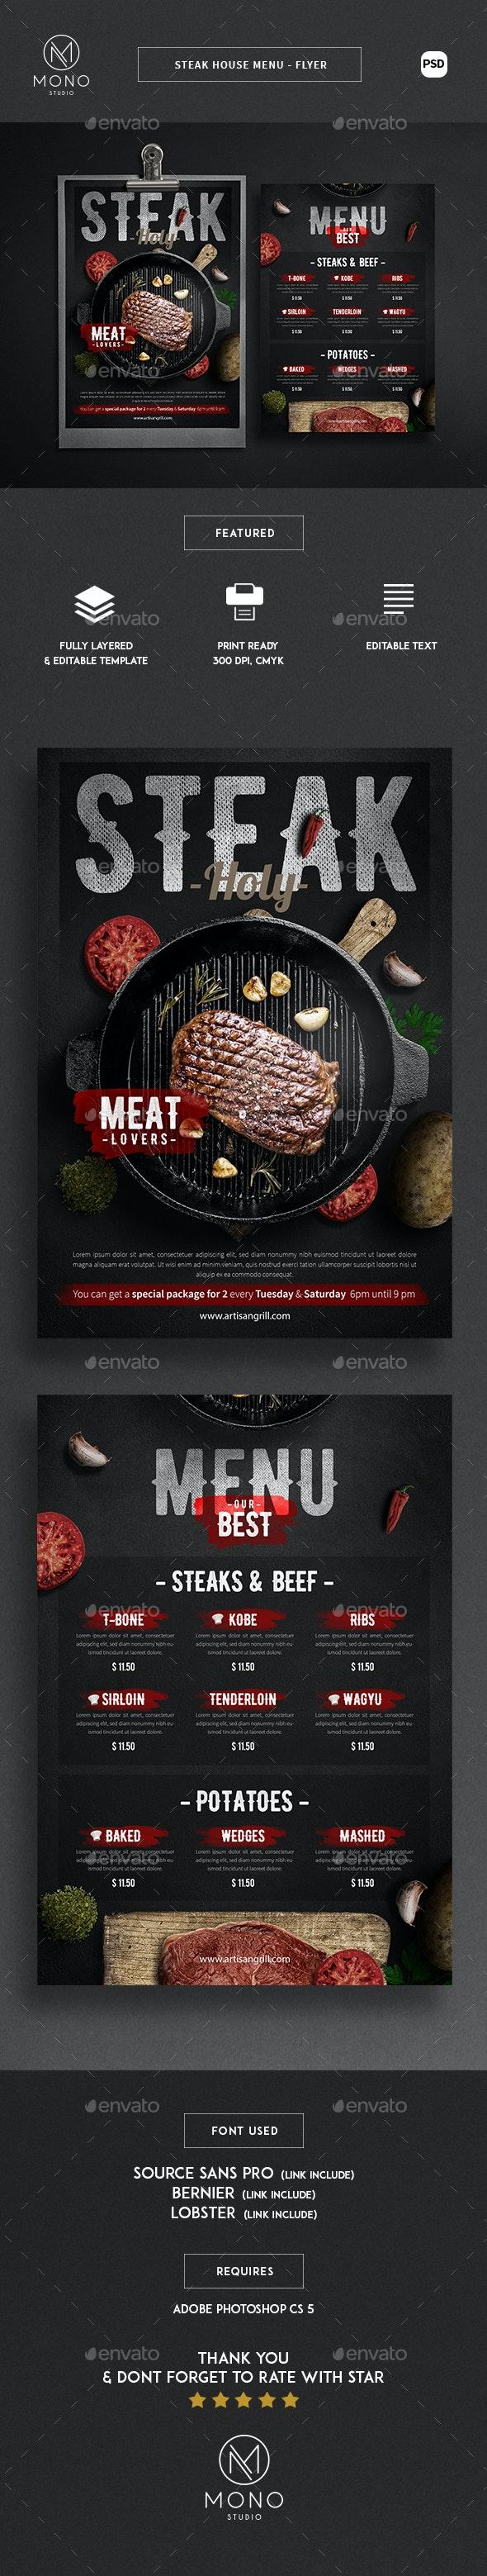 Steak House Menu - Flyer - Food Menus Print Templates